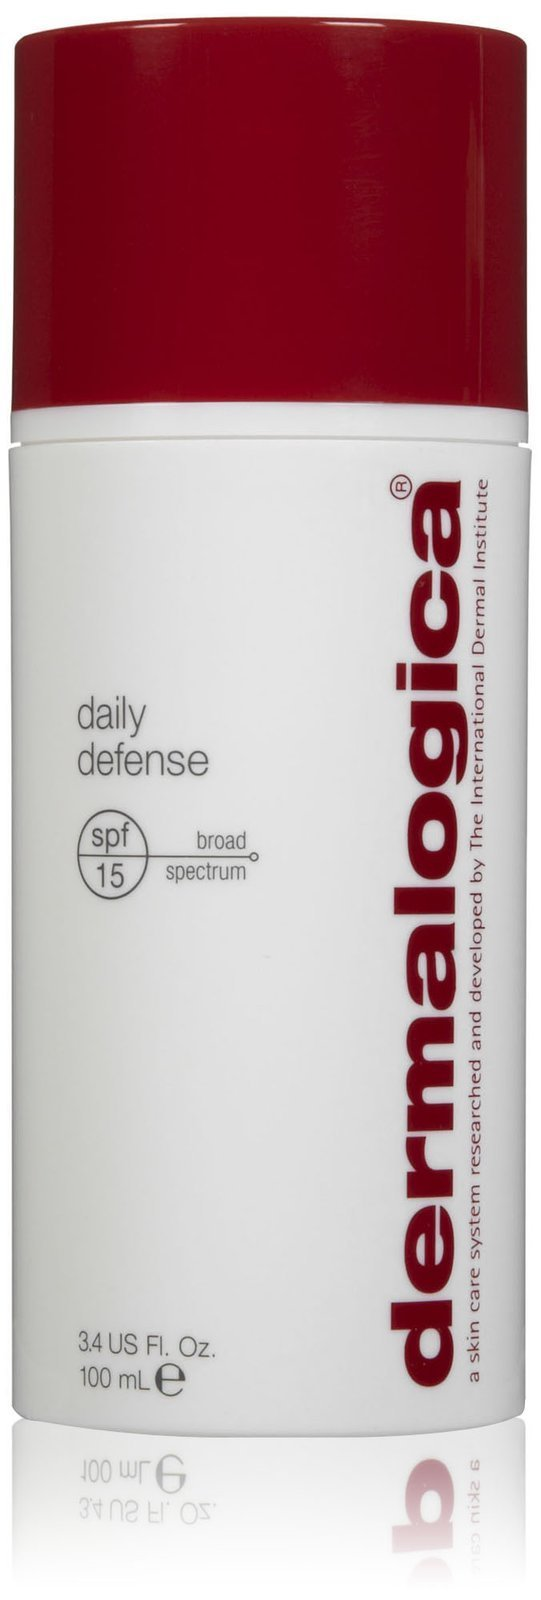 dermalogica Daily Defense Block-3.4 oz.